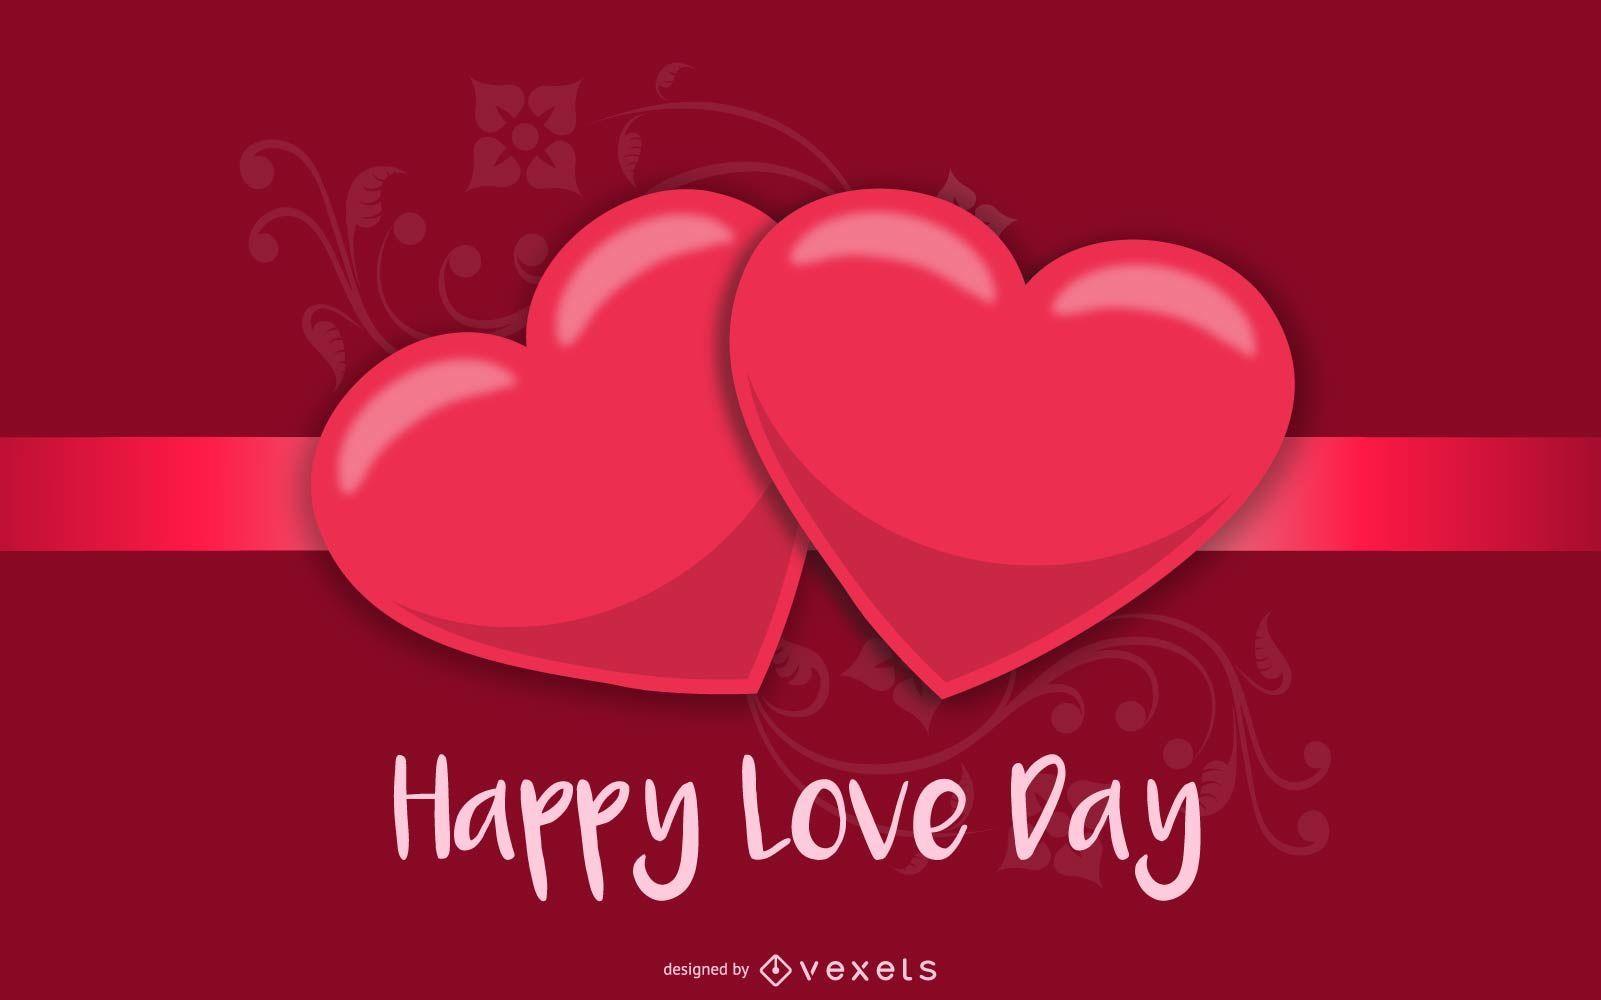 Glossy Red Valentine Greeting Card